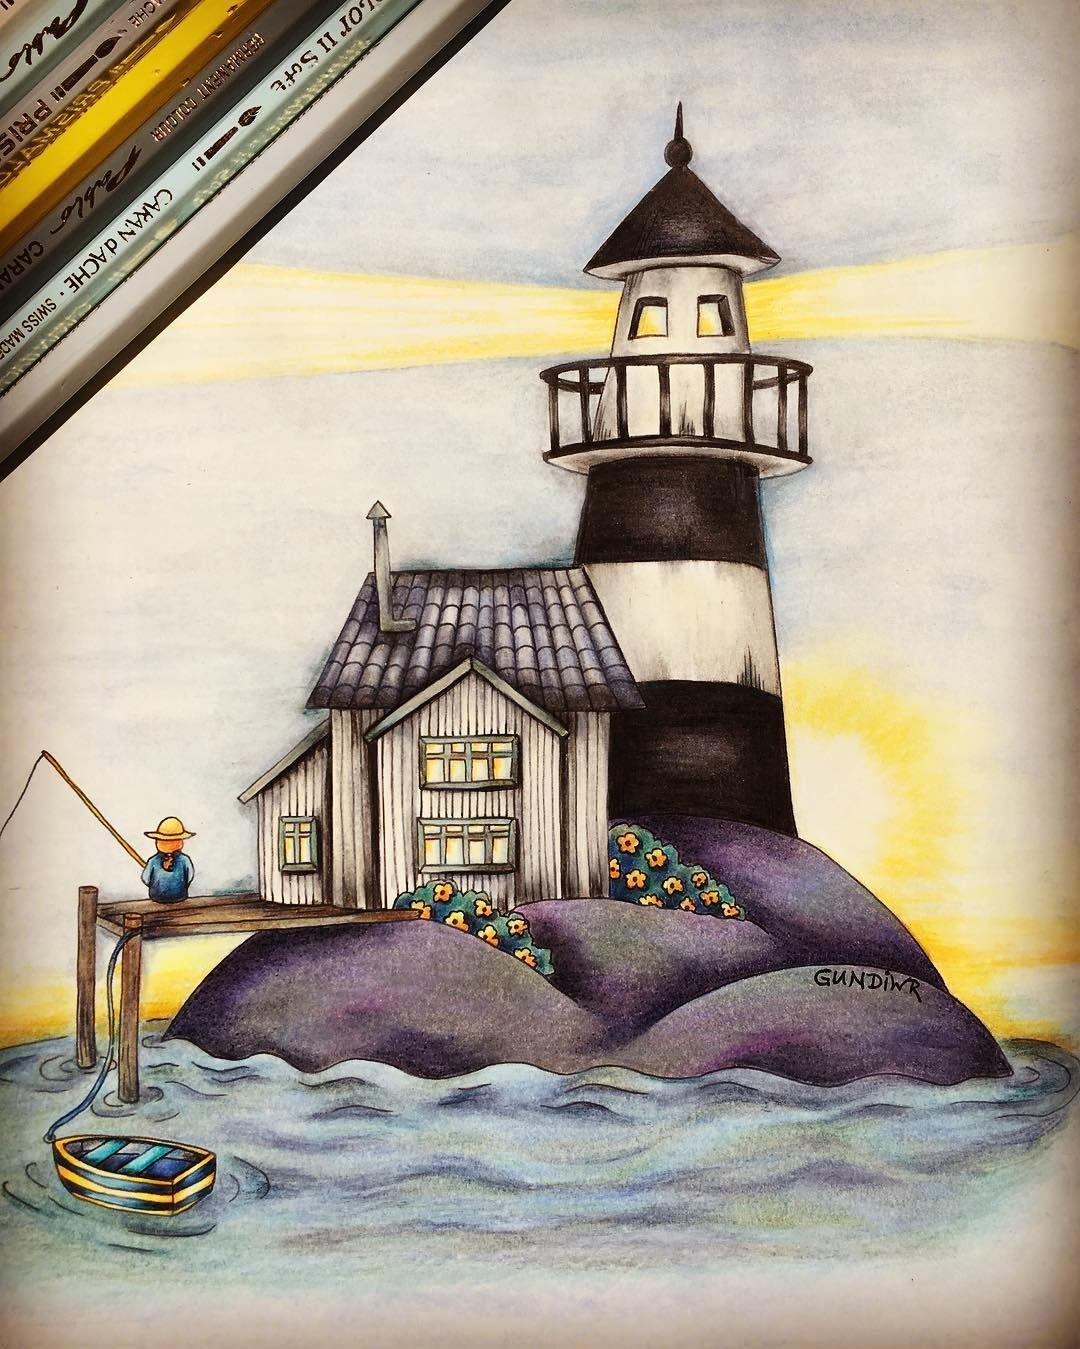 A Sunny Weekend To All Of You Lighthouse From Botanicum Maria Trolle Mariatrolle Botanicum Lighthouse Kleurboek Kleurpotlood Kunst Kleuren